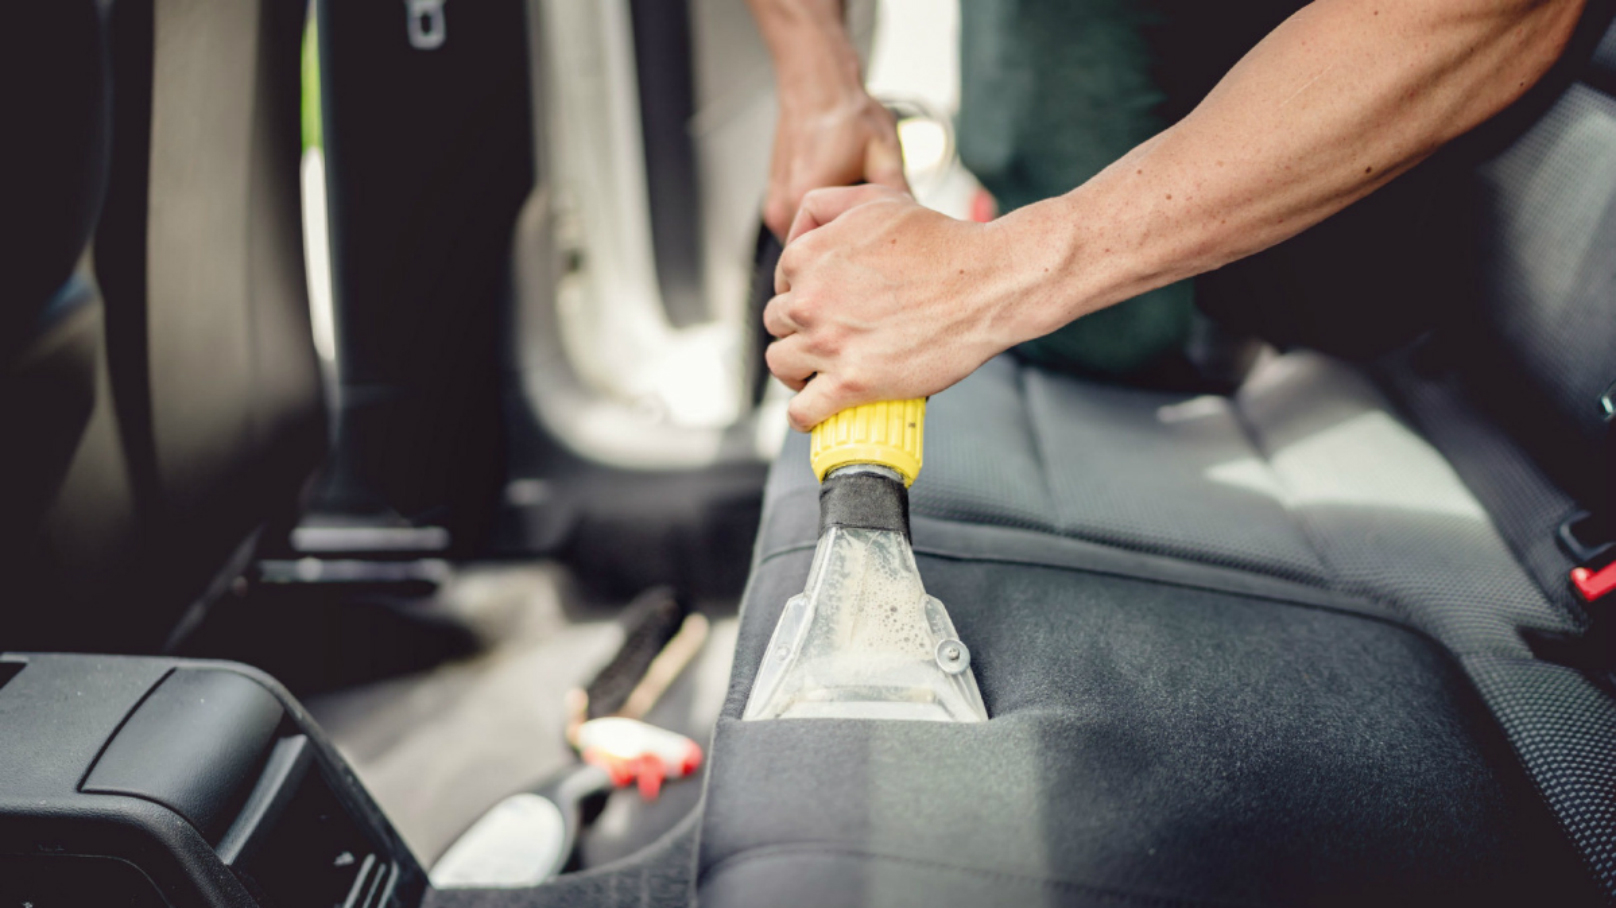 Auto Detailing Vacuuming